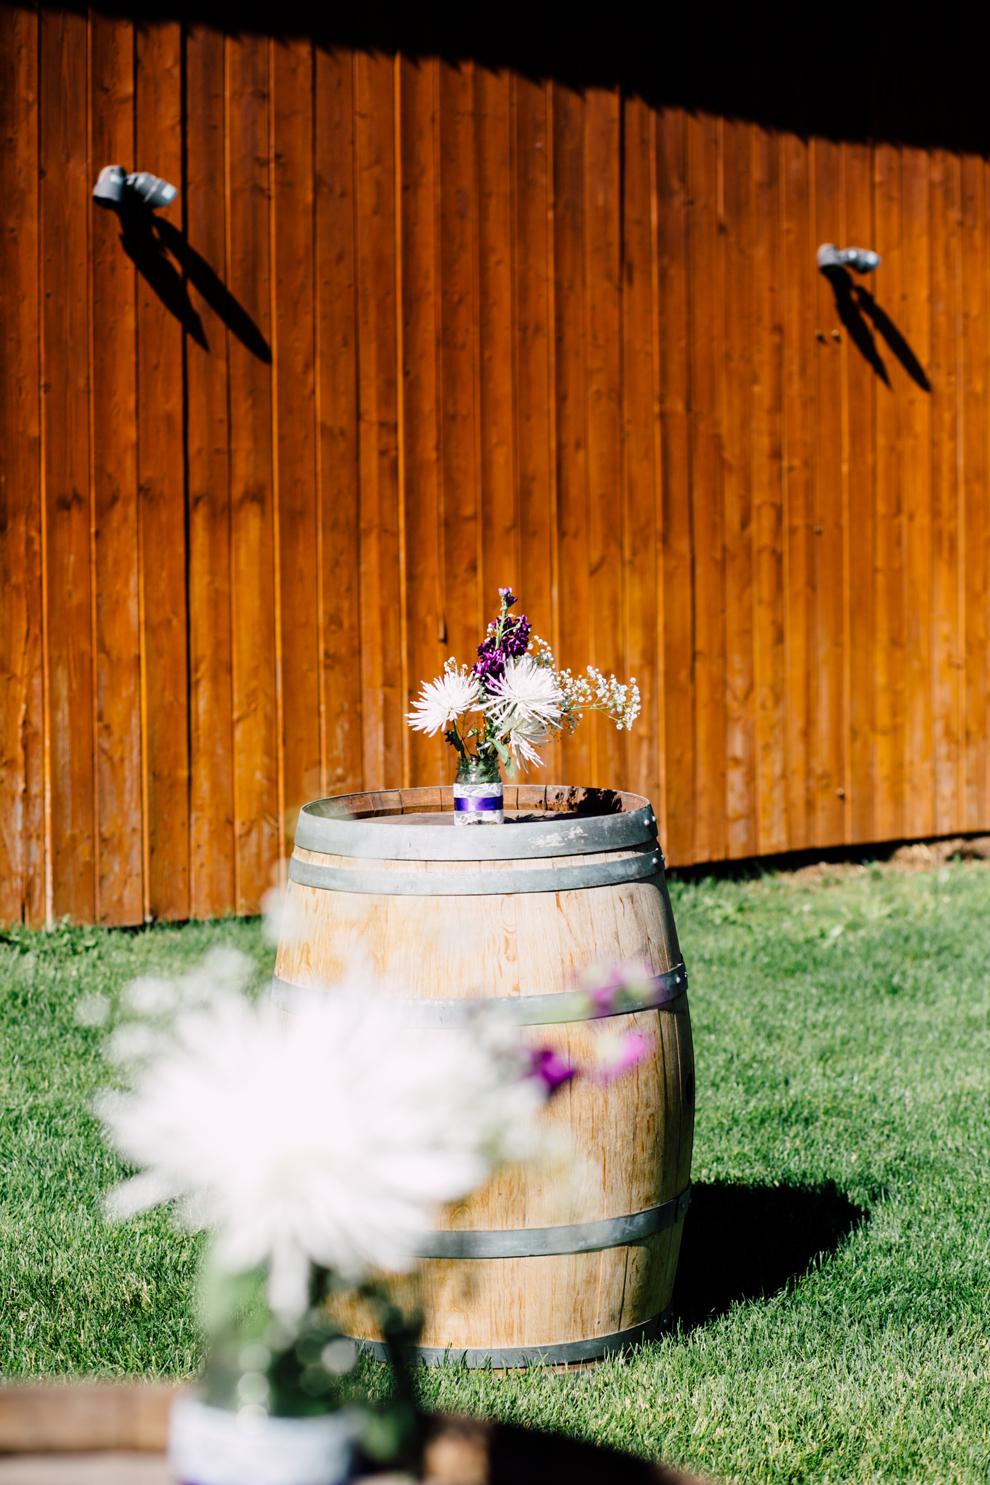 070-leavenworth-mountain-springs-lodge-wedding-karena-saul-katheryn-moran-photography.jpg